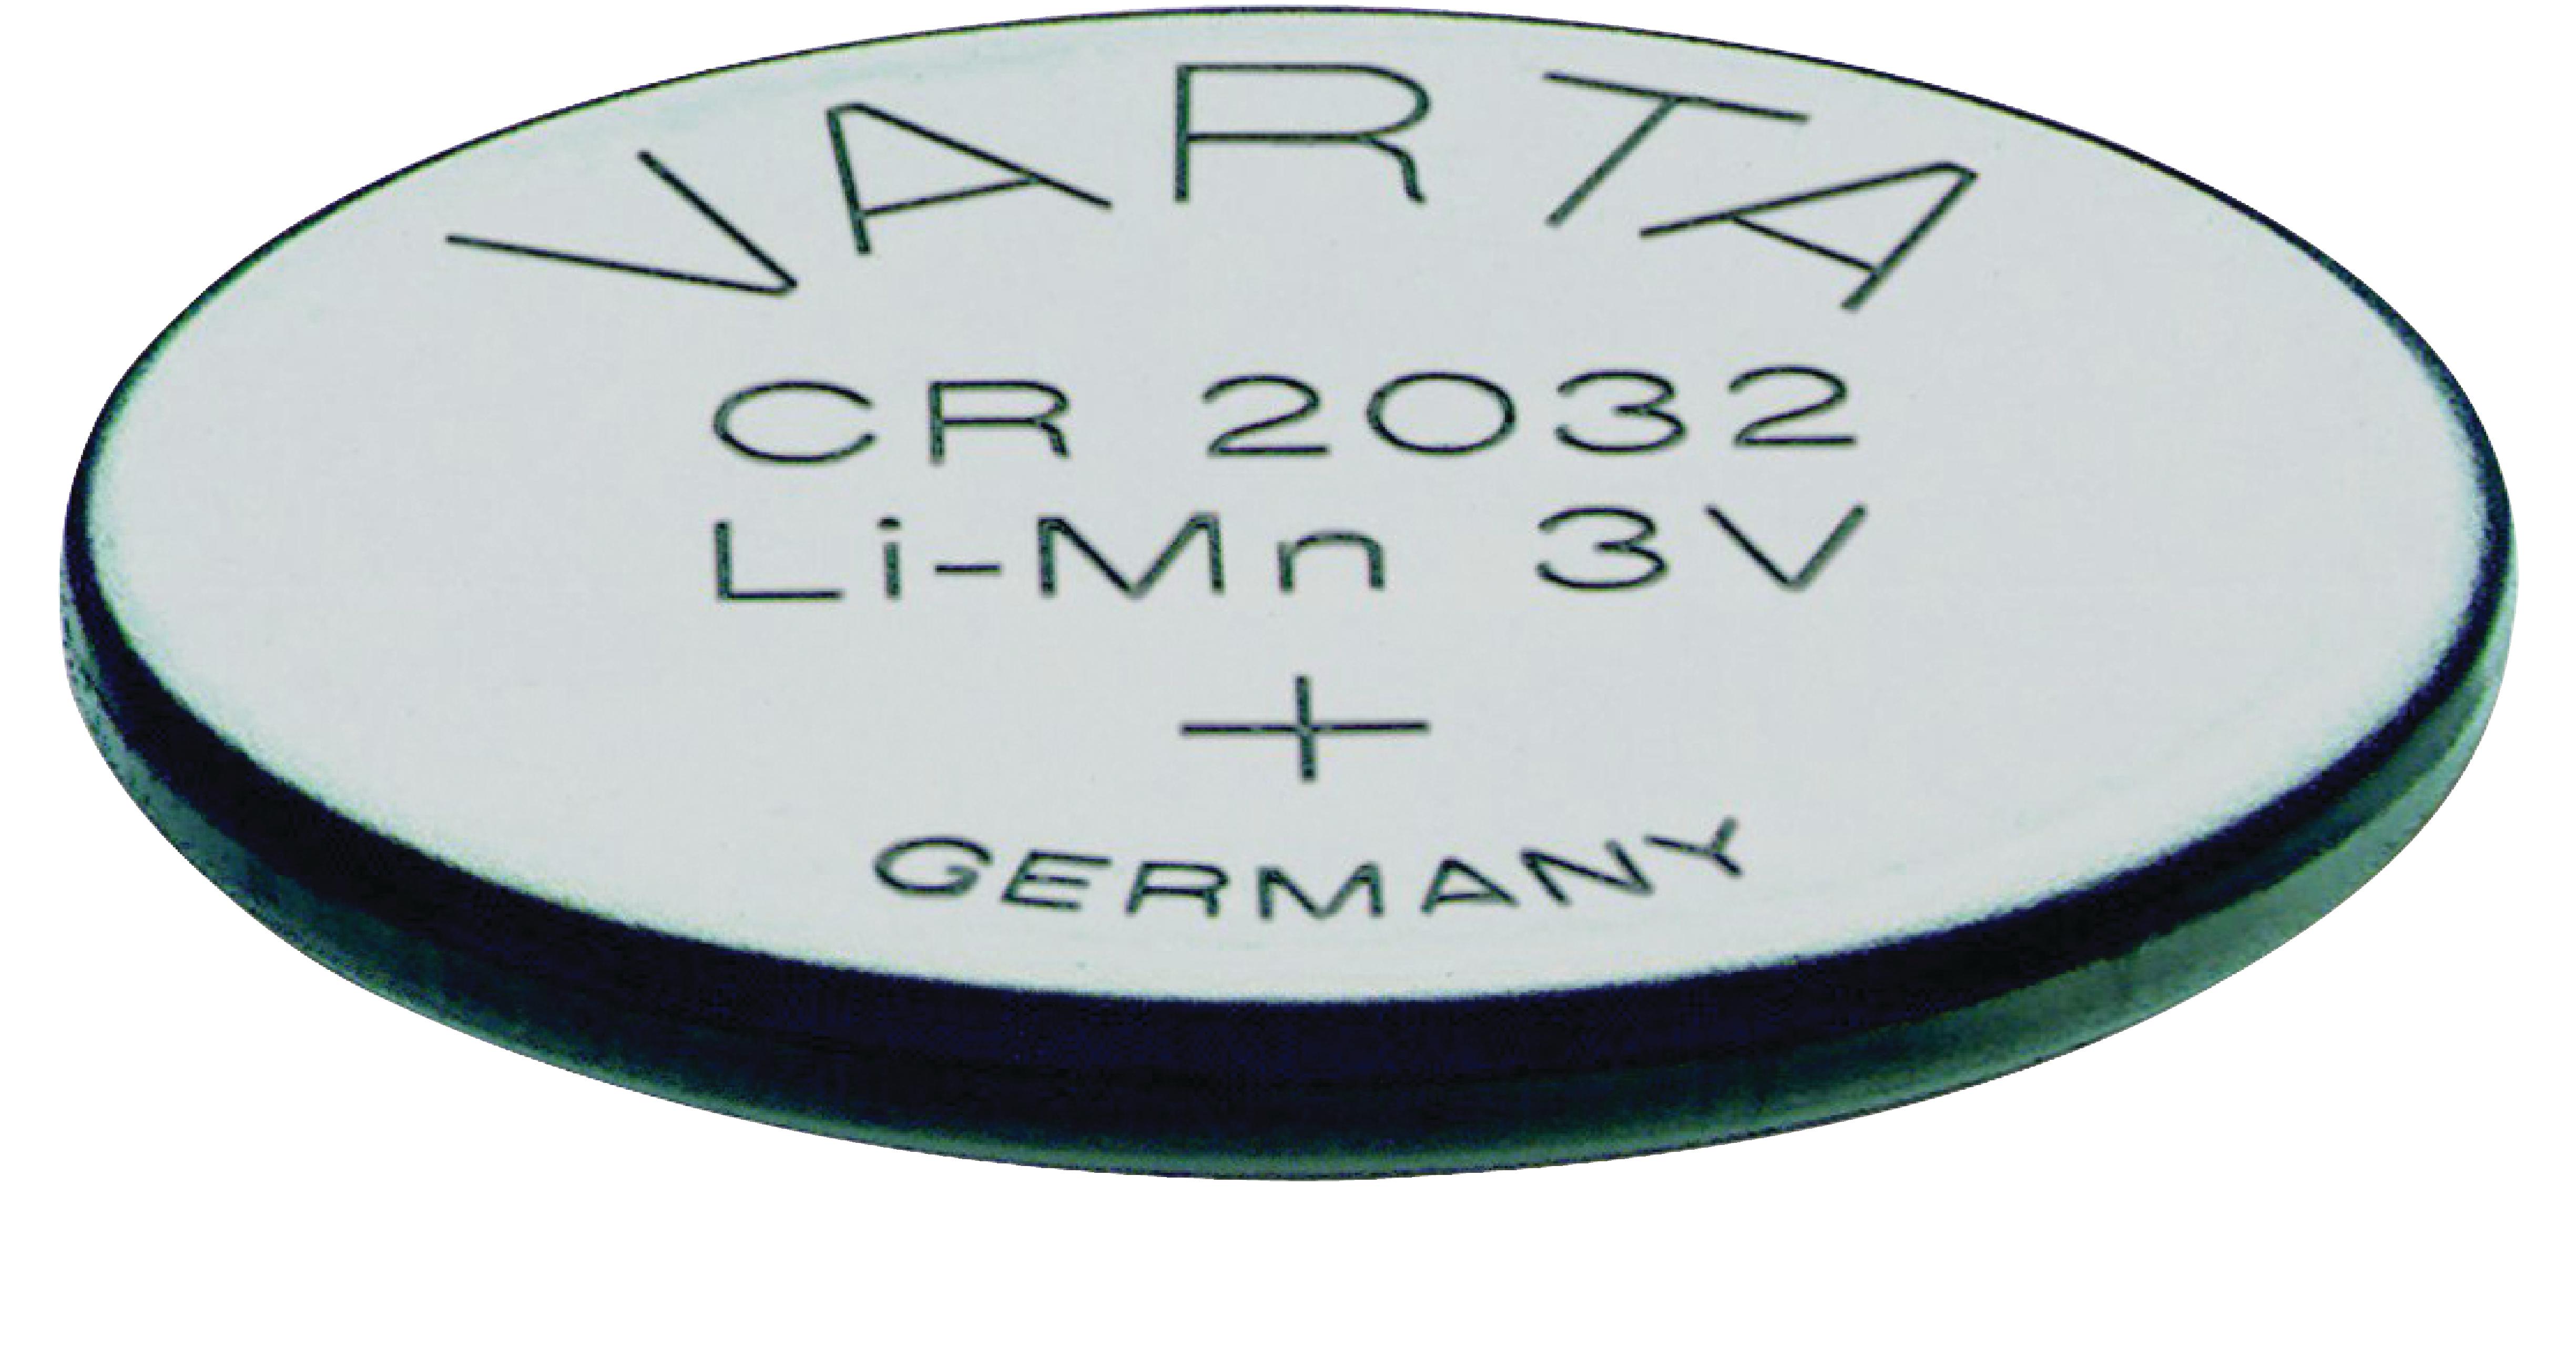 varta cr2032 varta lithium button cell battery cr2032. Black Bedroom Furniture Sets. Home Design Ideas